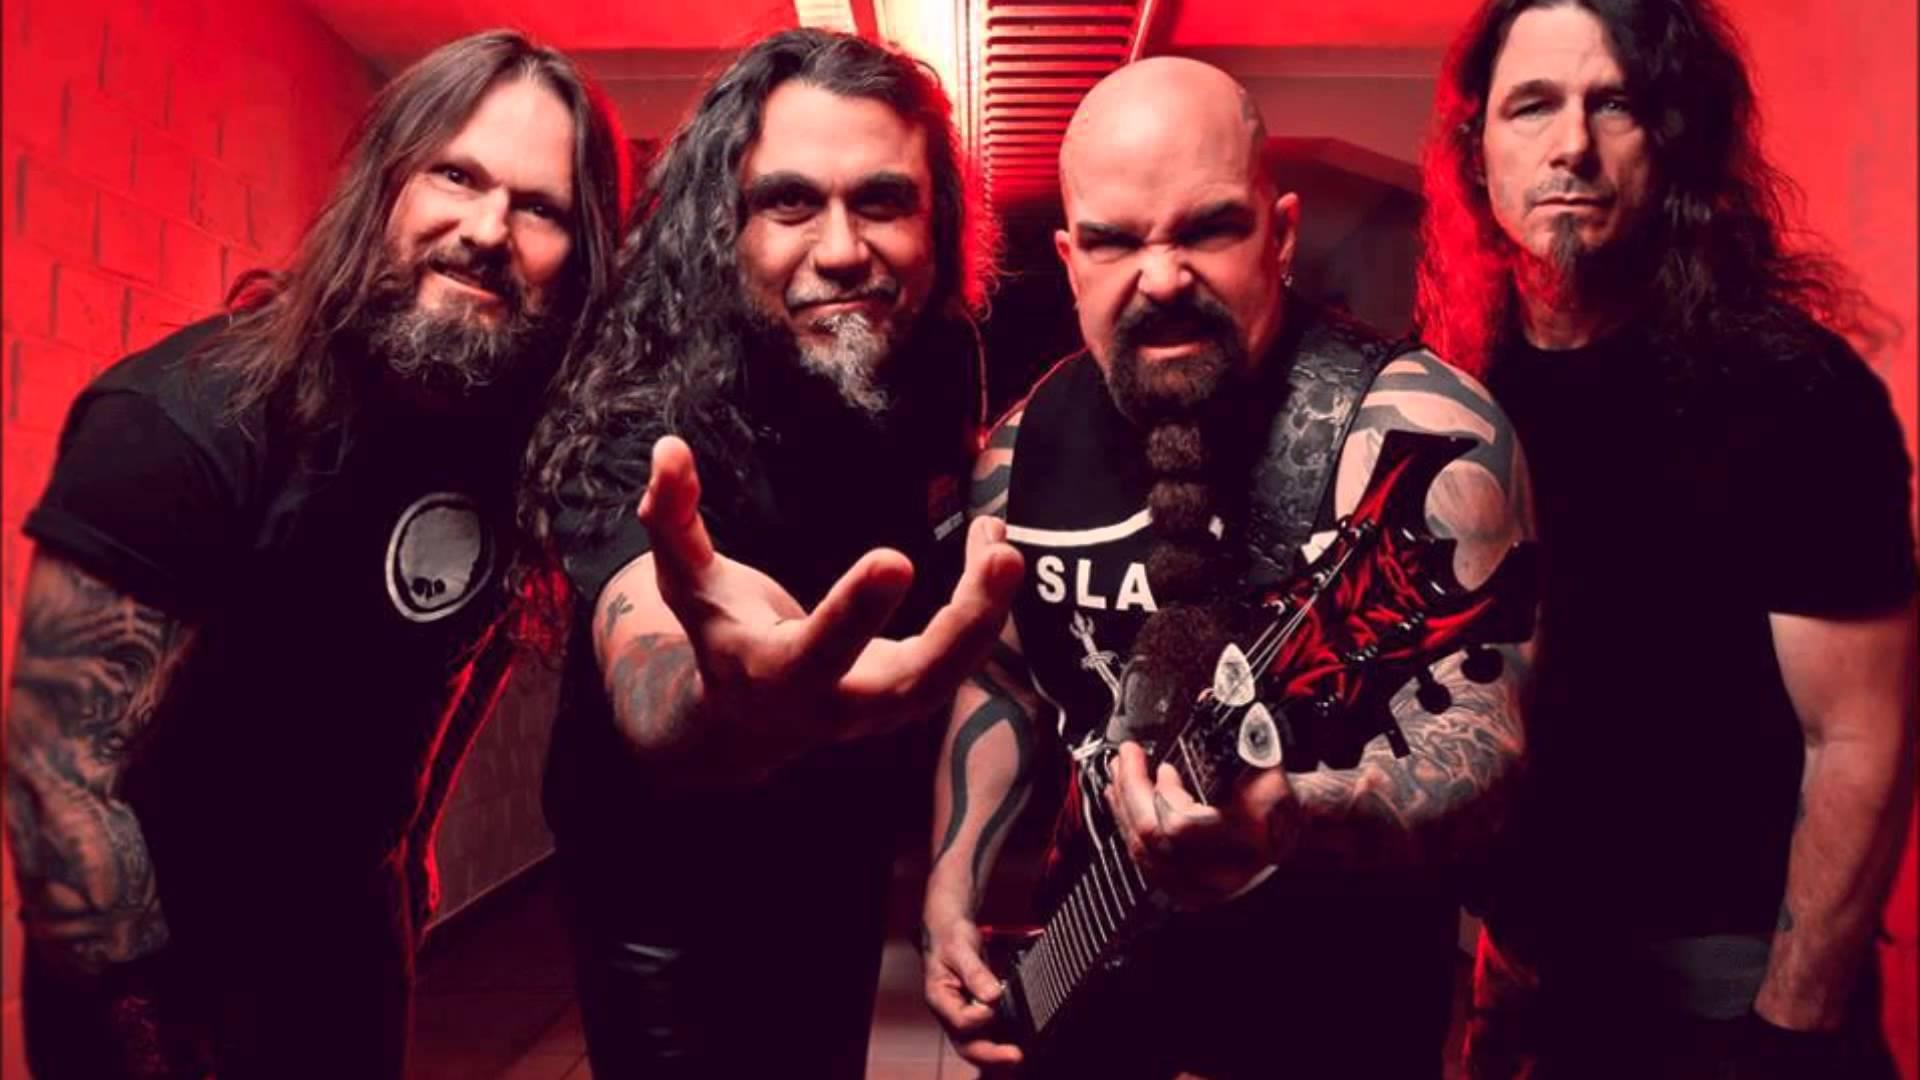 Image: Slayer